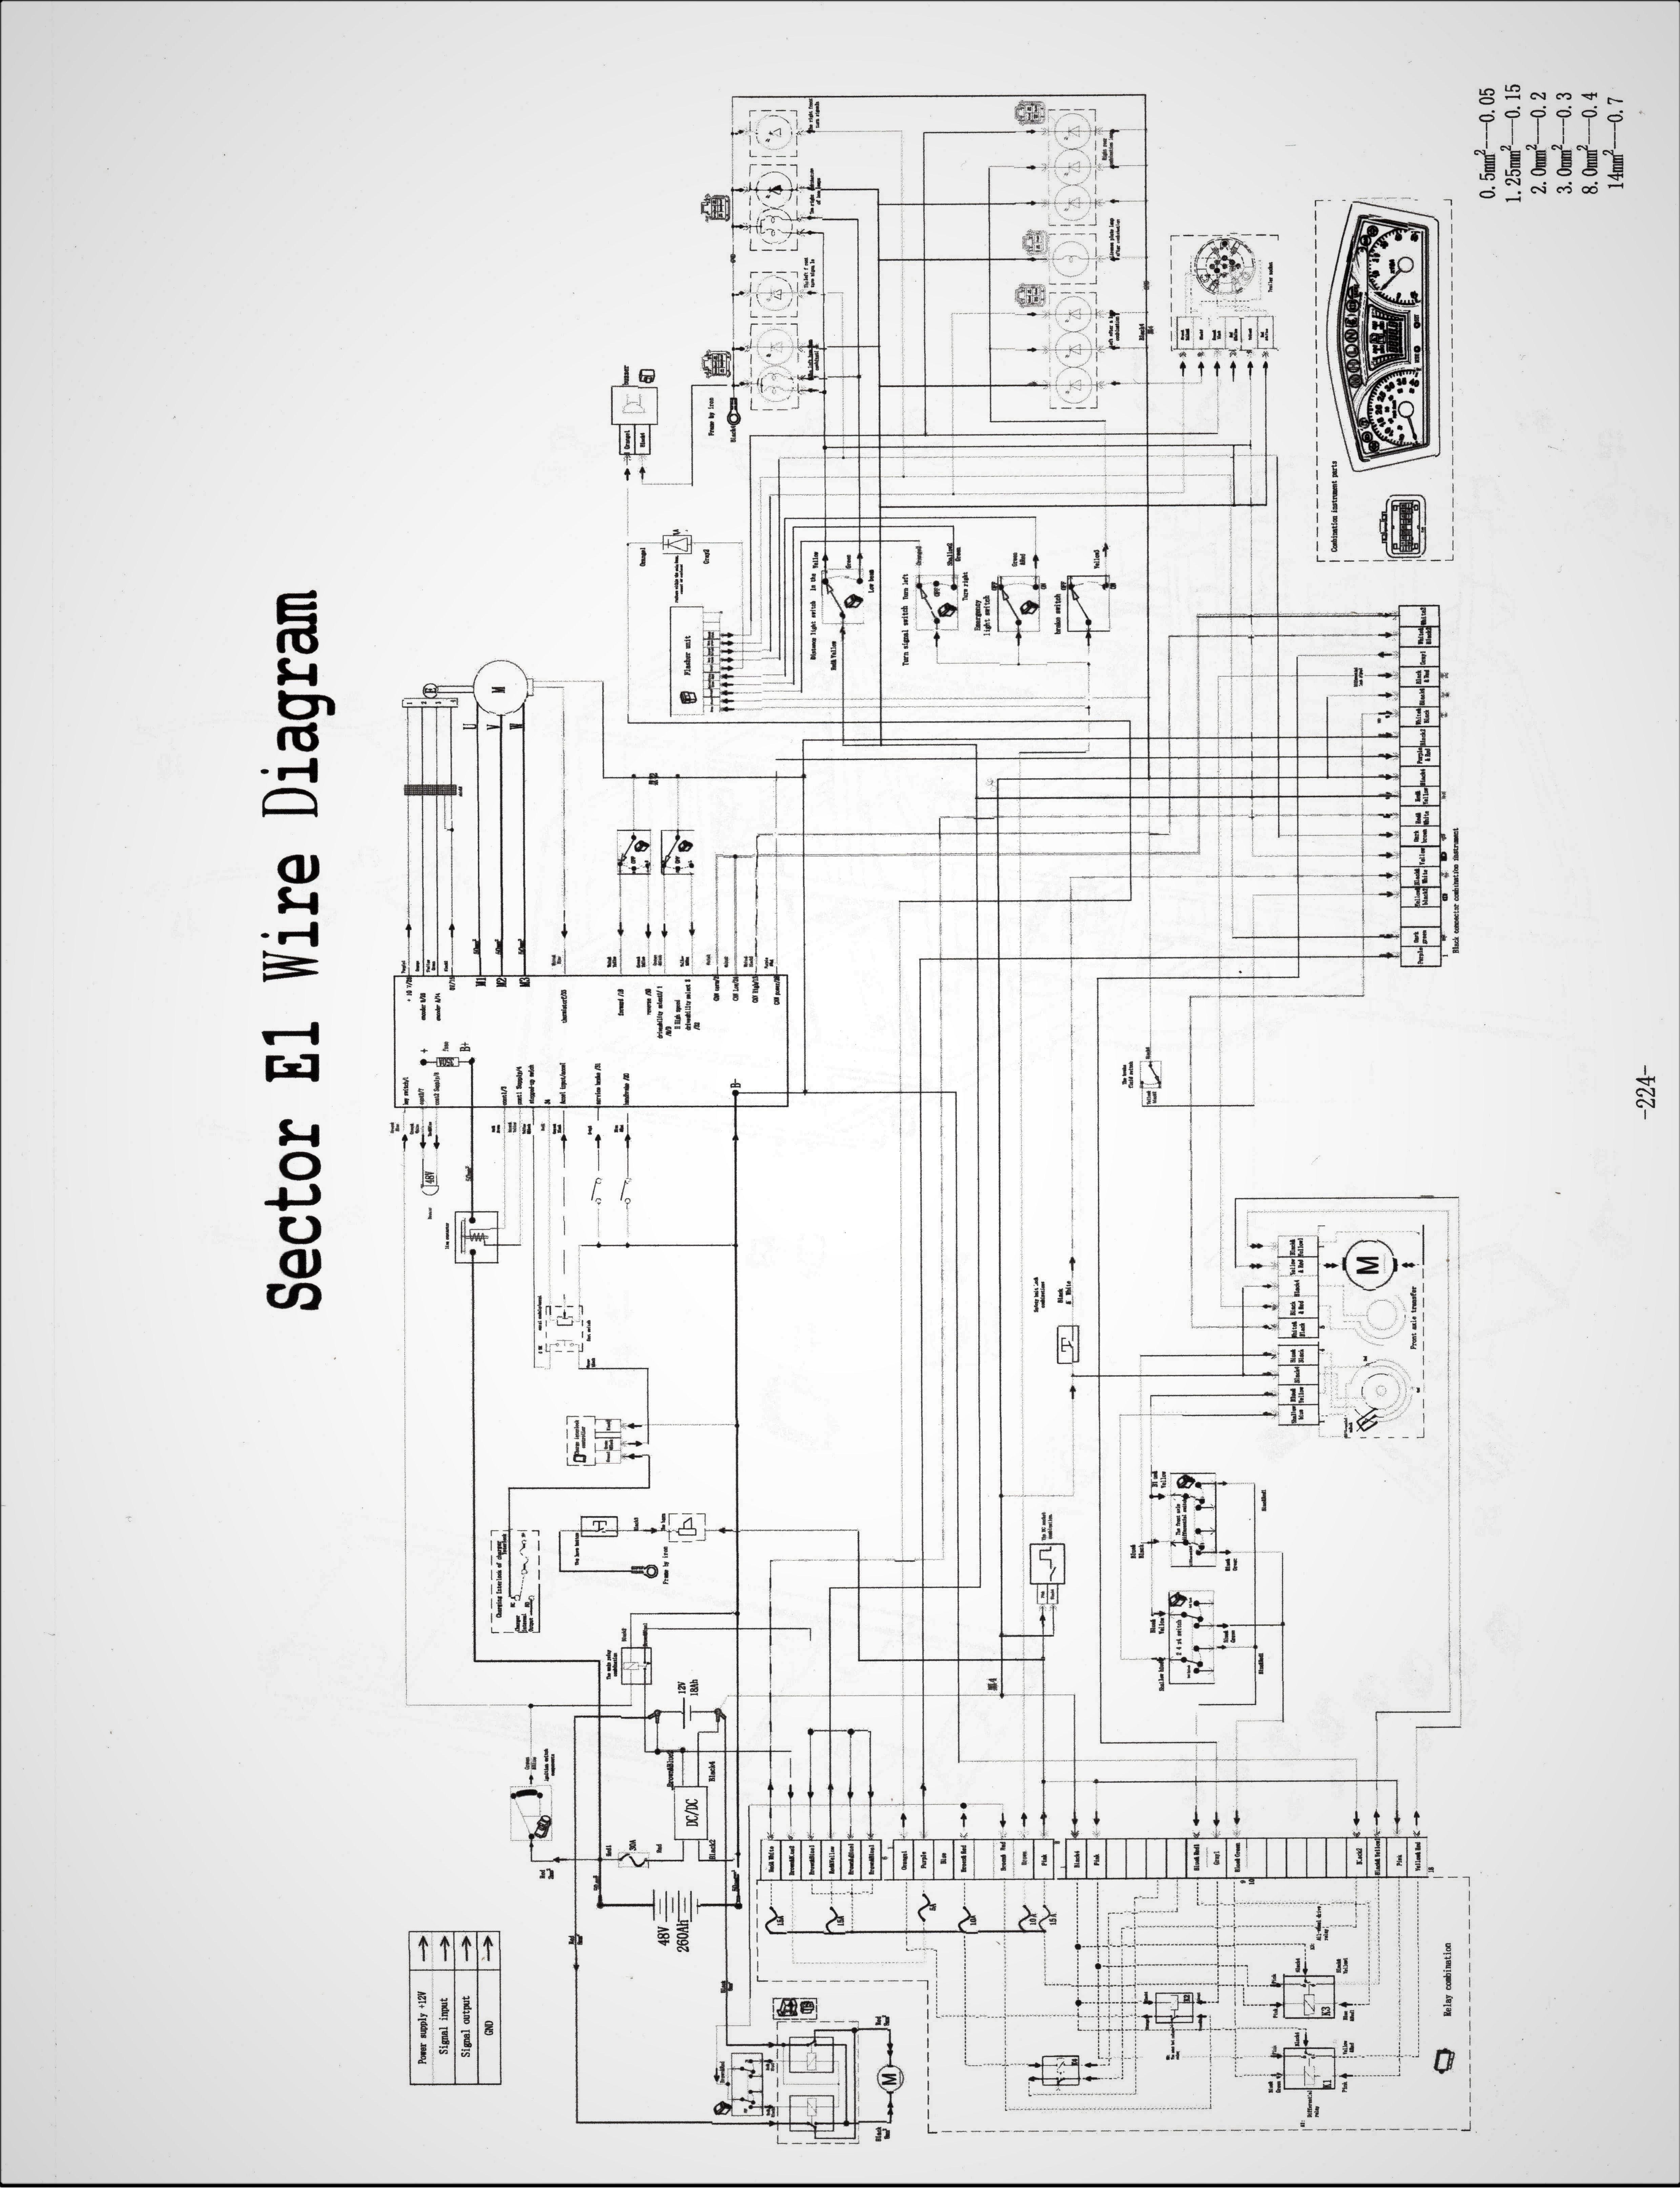 Sector E1 Electric Battery Overheat - Hisun Utv Sxs Forum